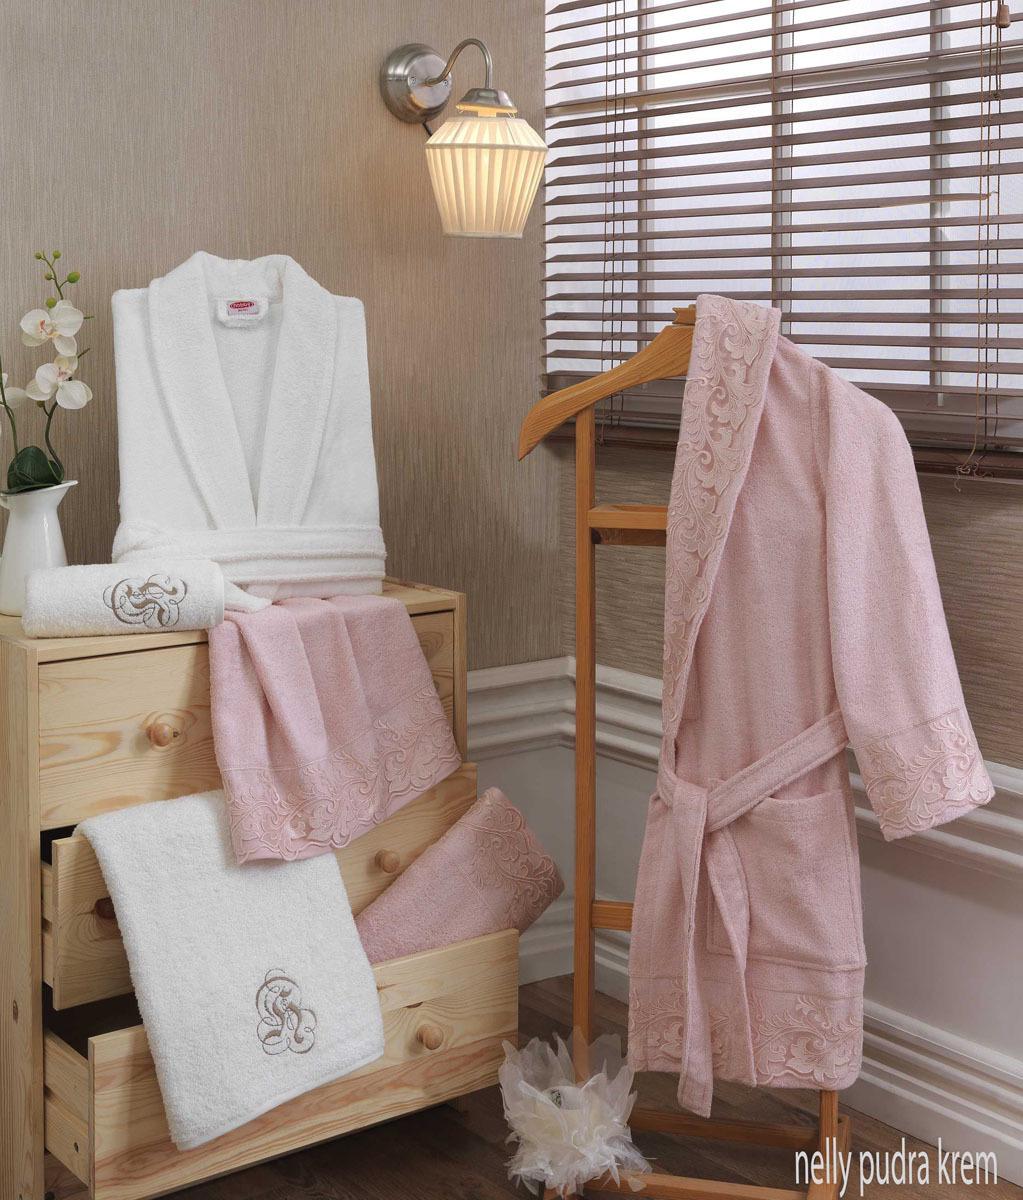 Халаты из бамбукового волокна: плюсы, минусы, правила ухода